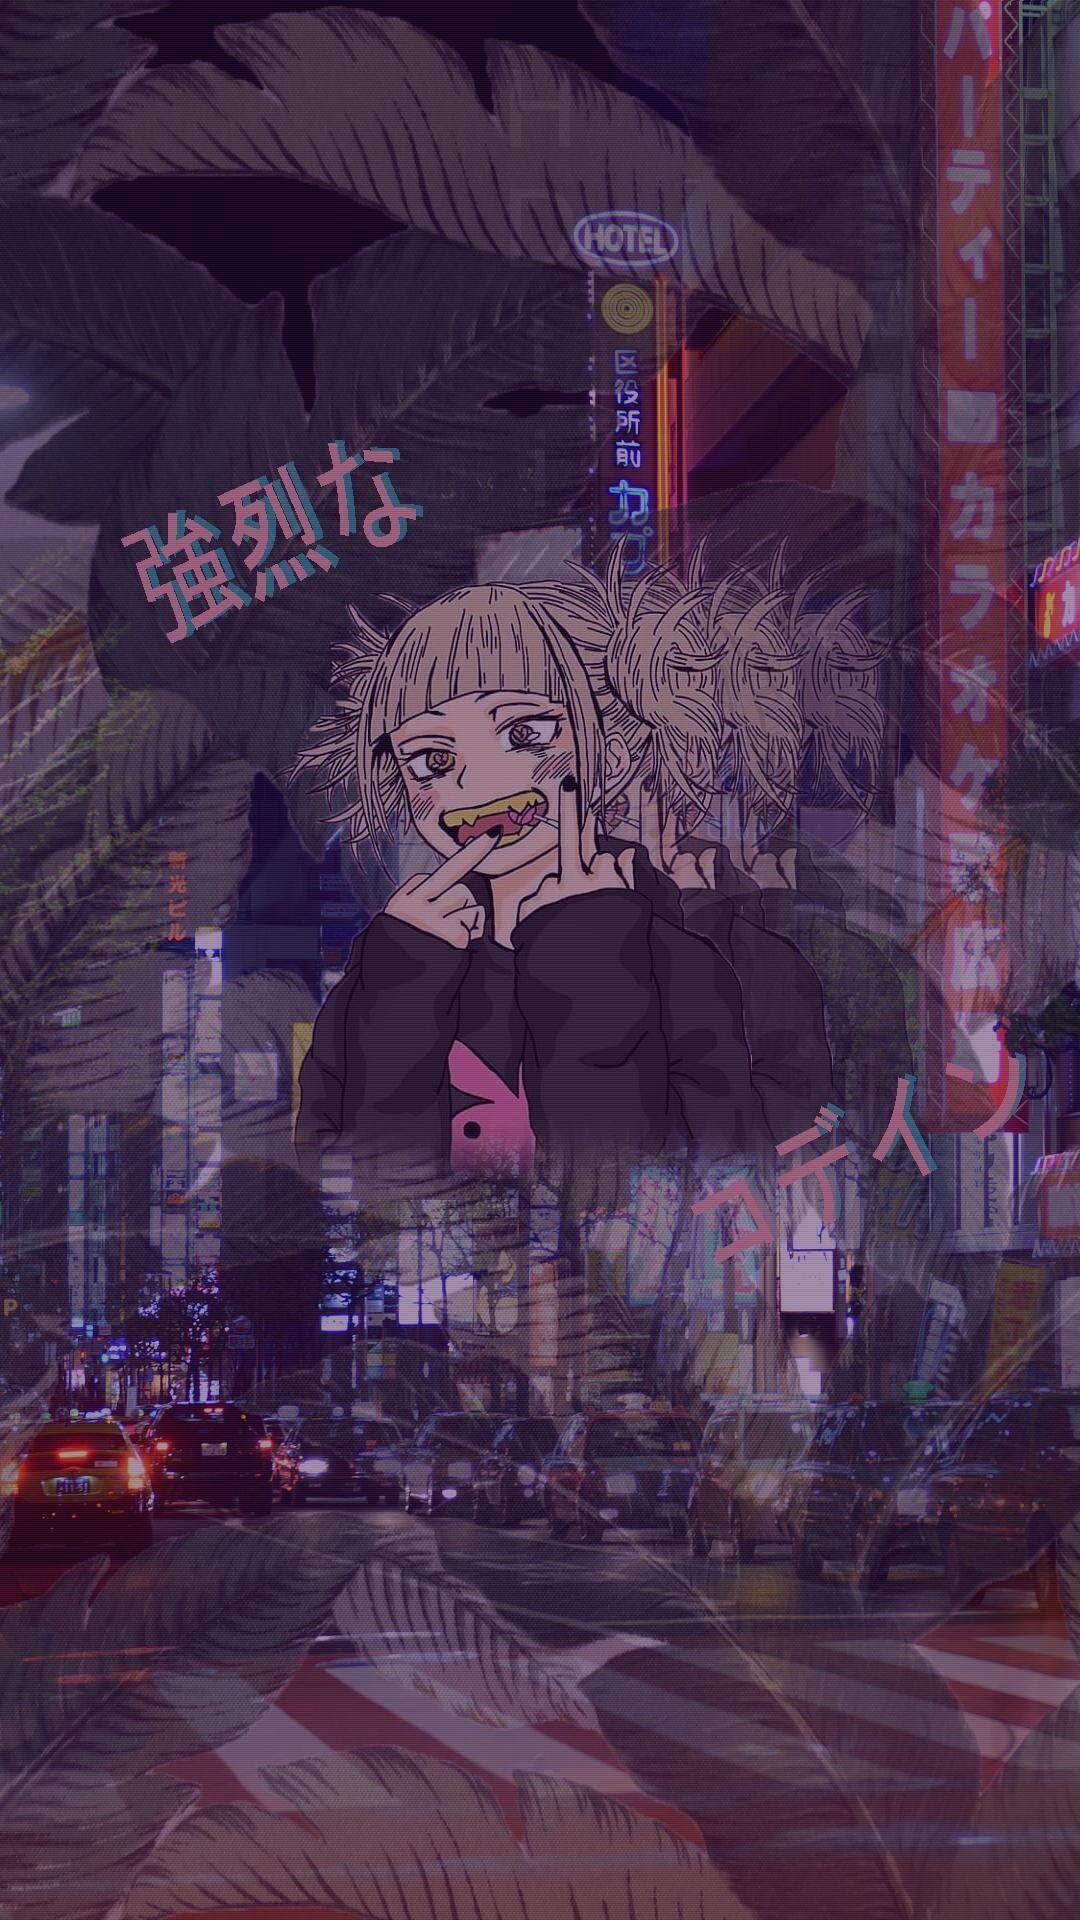 Aesthetic Anime Wallpaper HD Wallpapers wallpaper